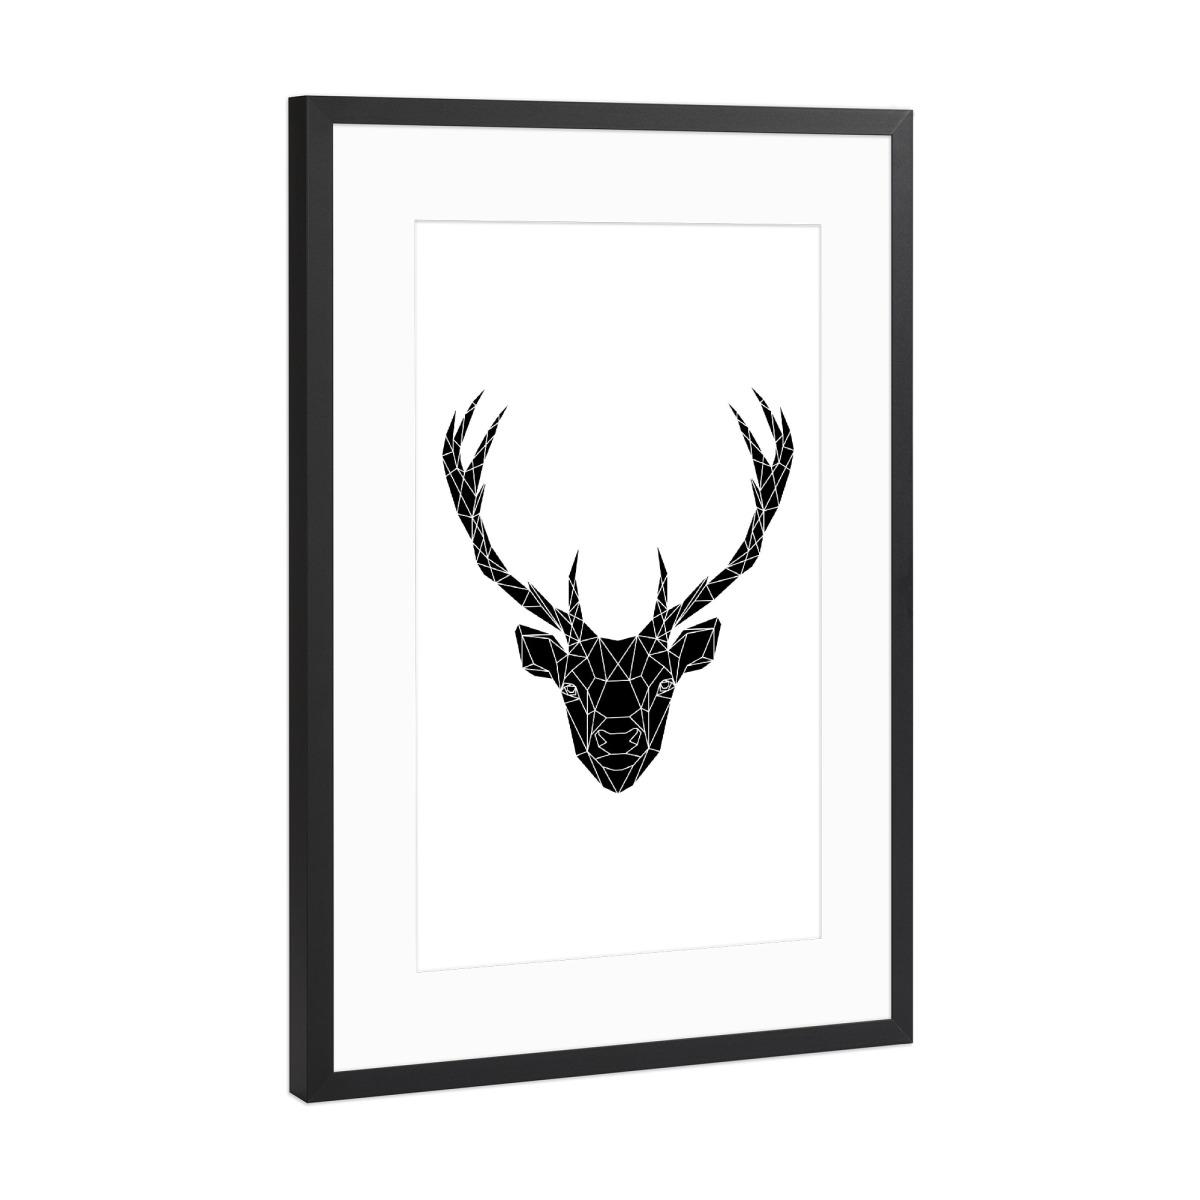 Geometric Deer Head Black als Gerahmt bei artboxONE kaufen